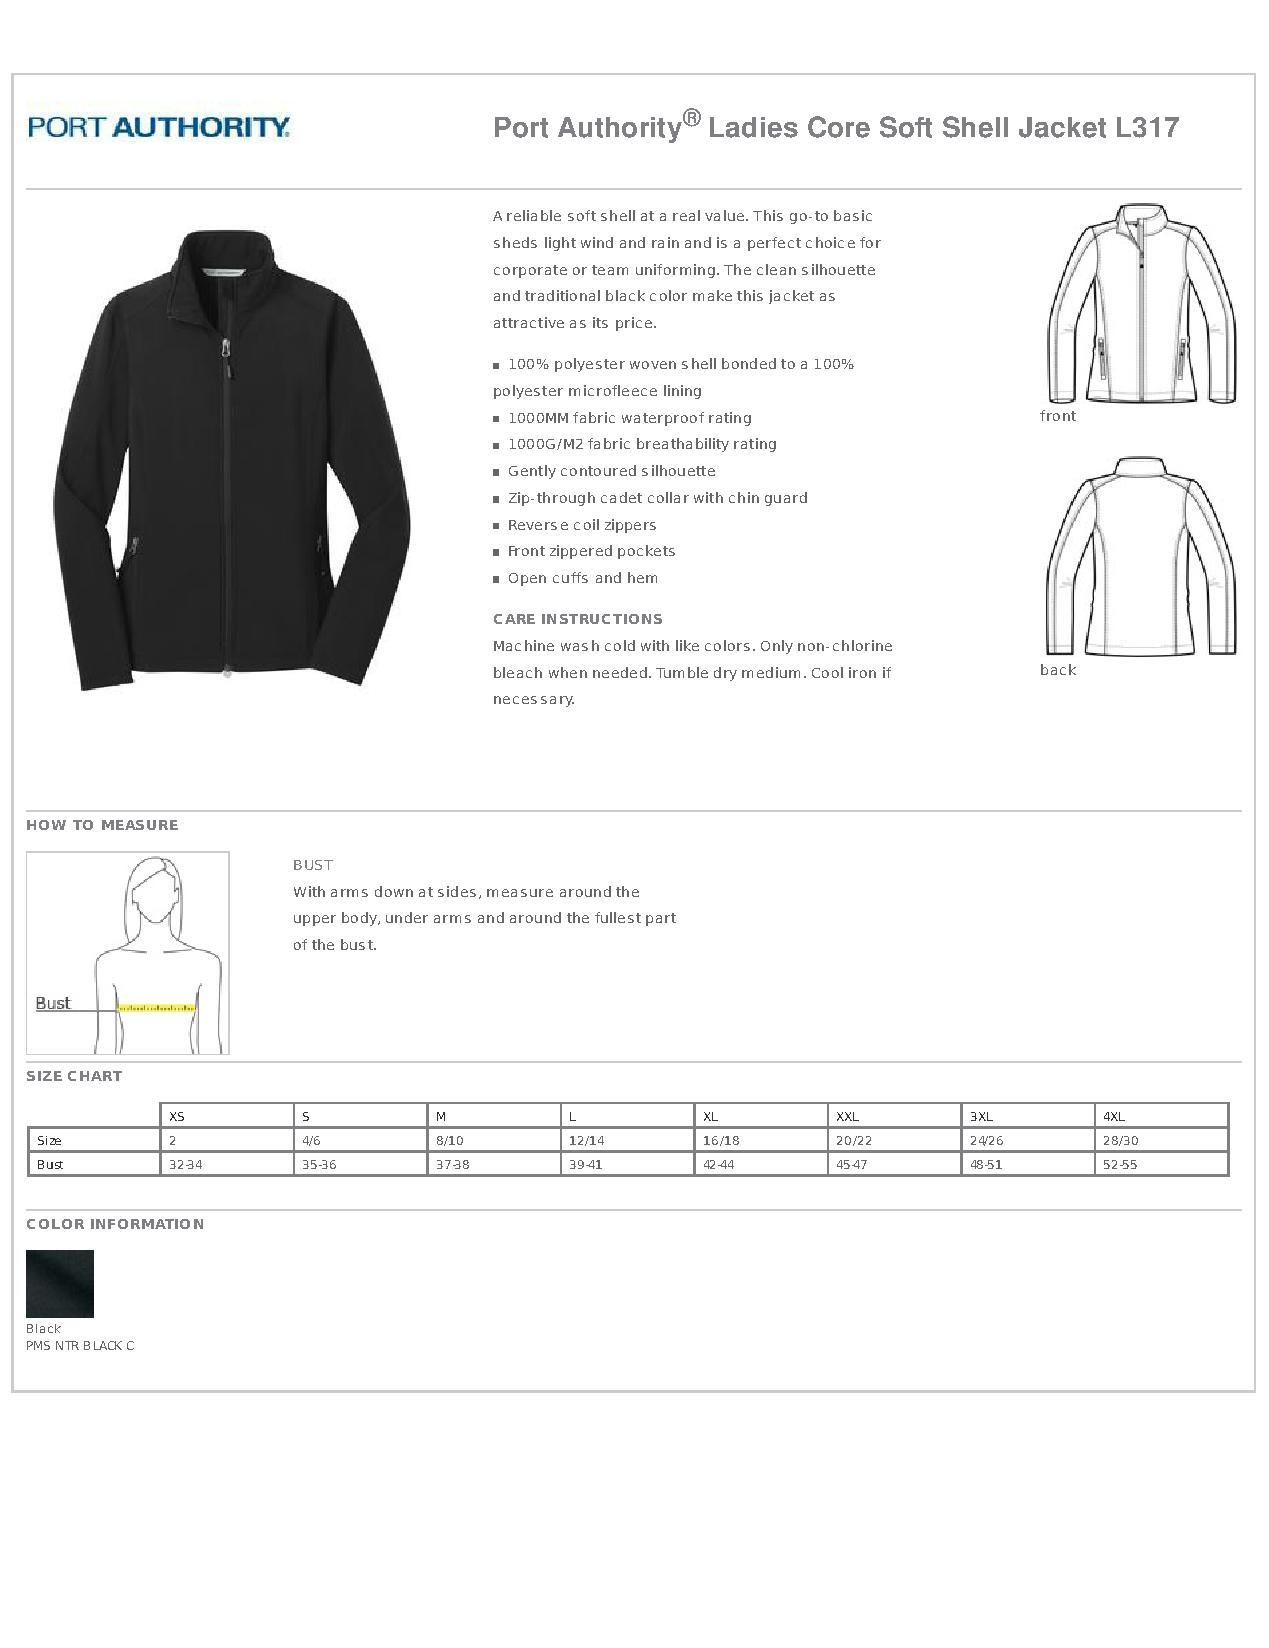 Soft Shell Jacket Xs Med 95 Size Chart